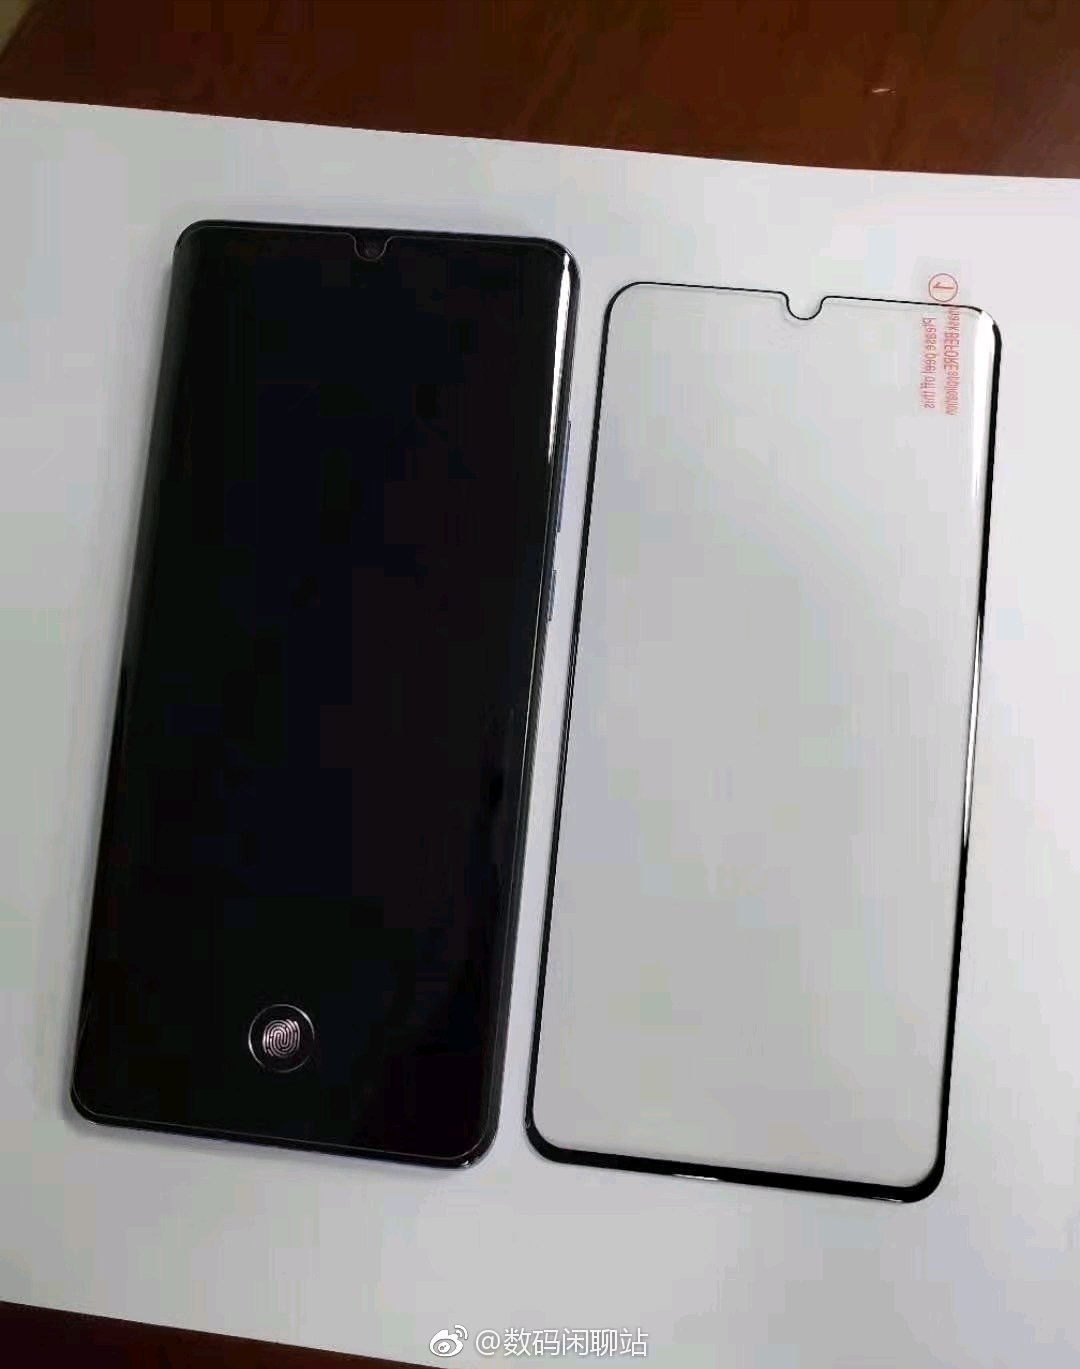 ¡Imagen de la vida real del Huawei P30 Pro filtrada!